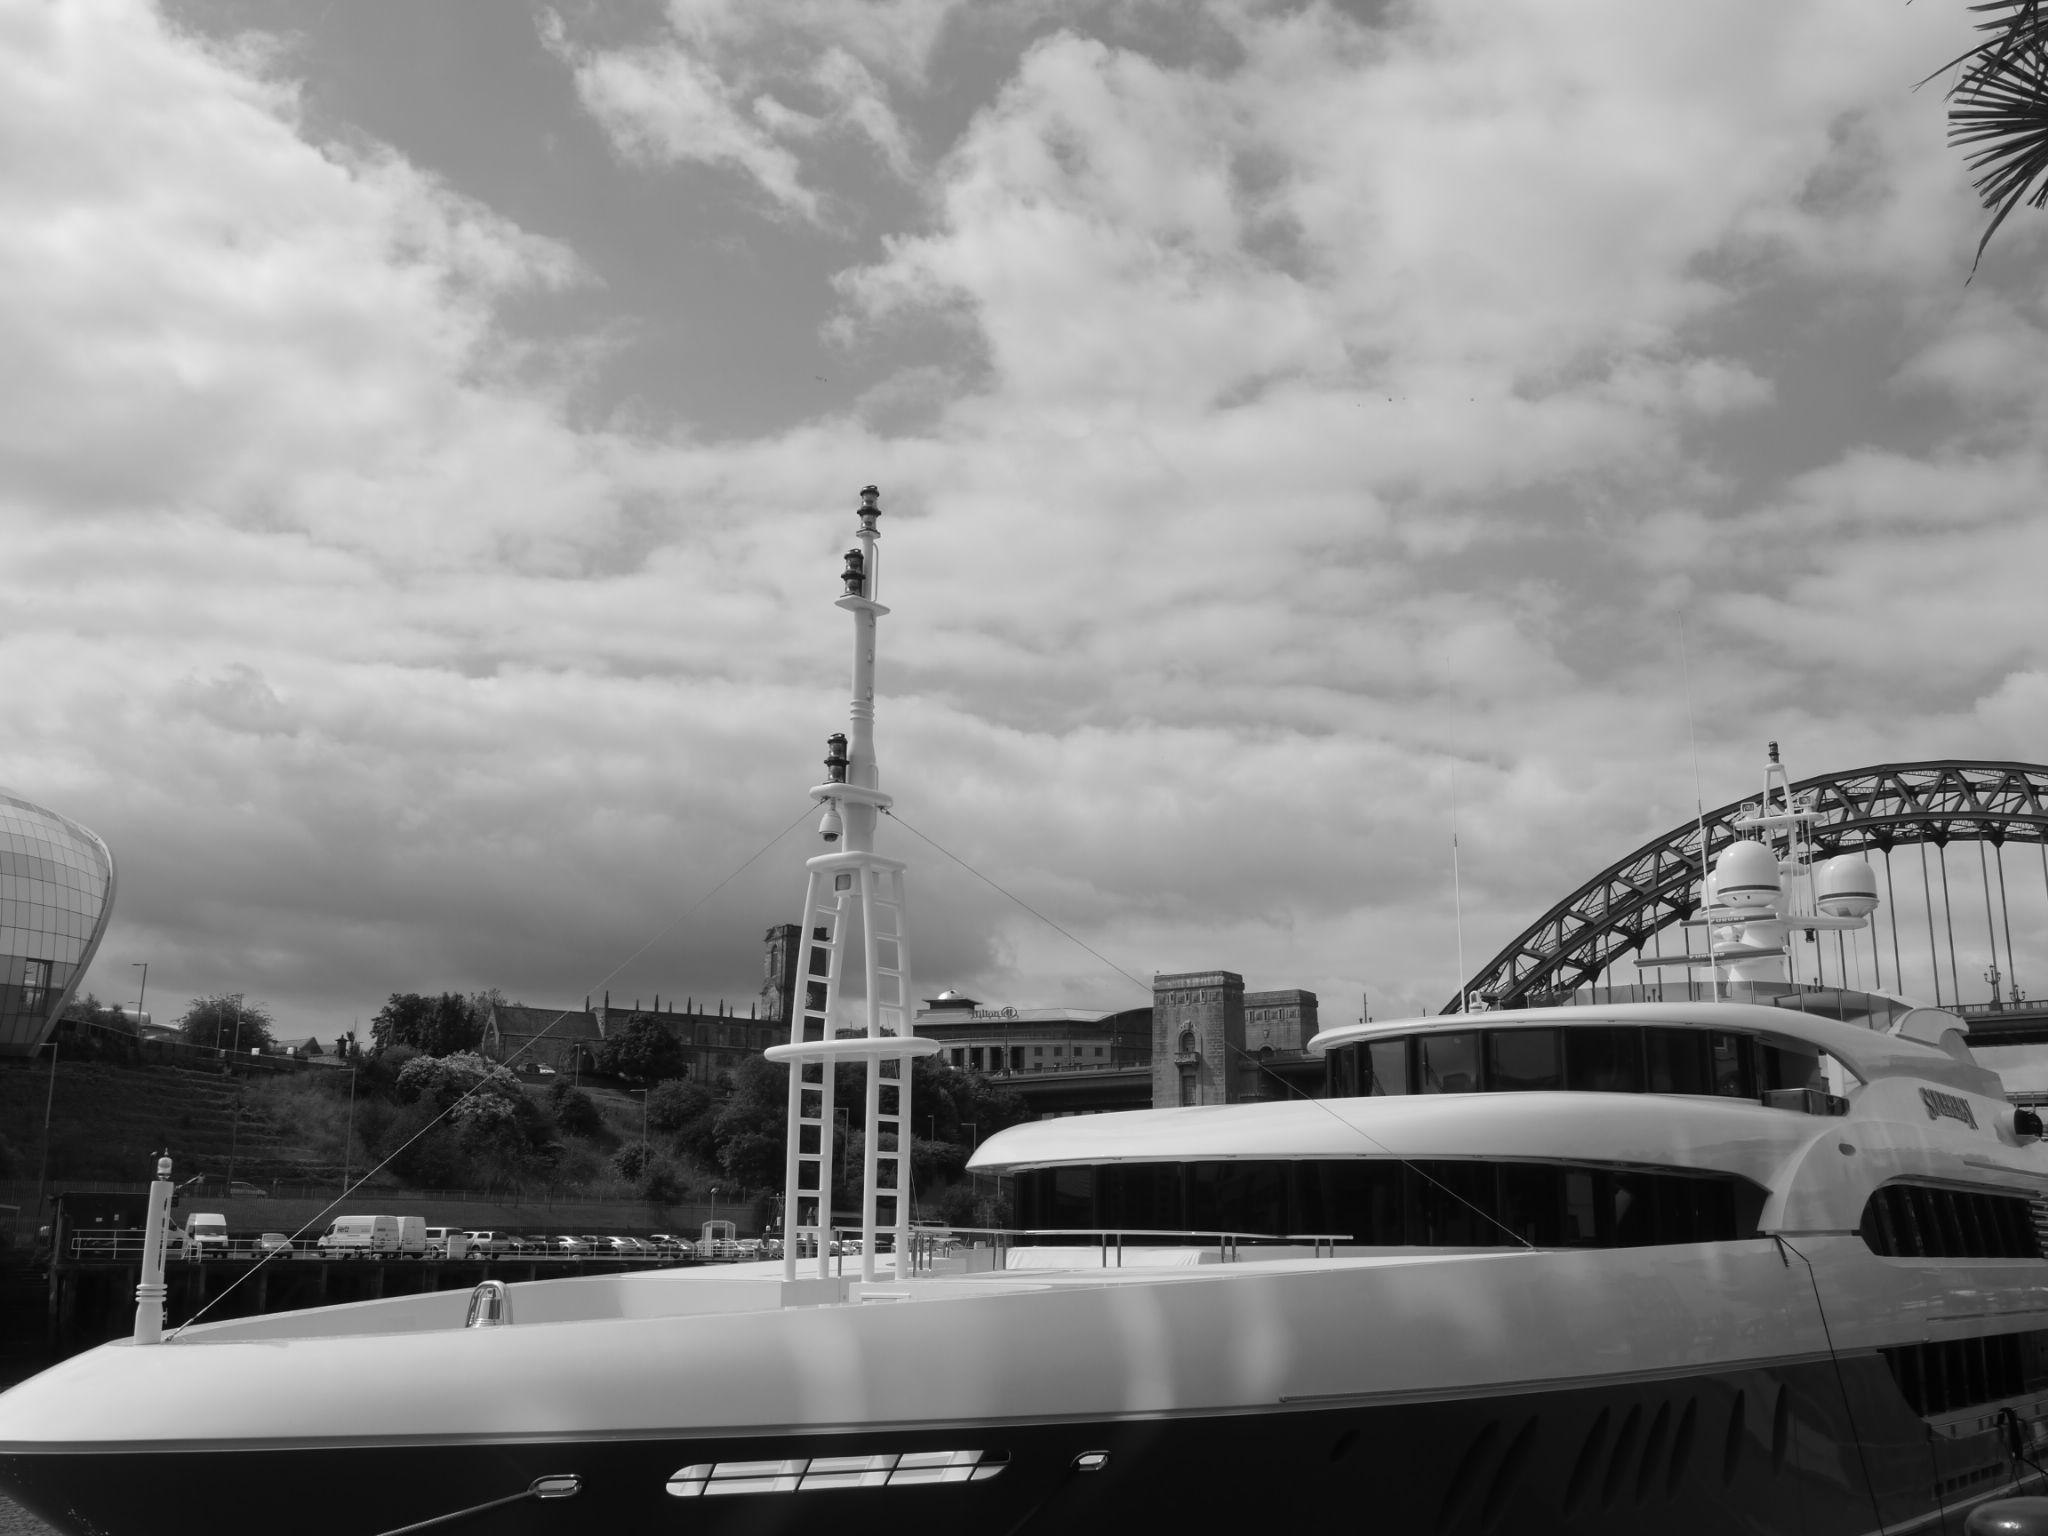 50 Million dollar boat on the Tyne today by Darren Turner